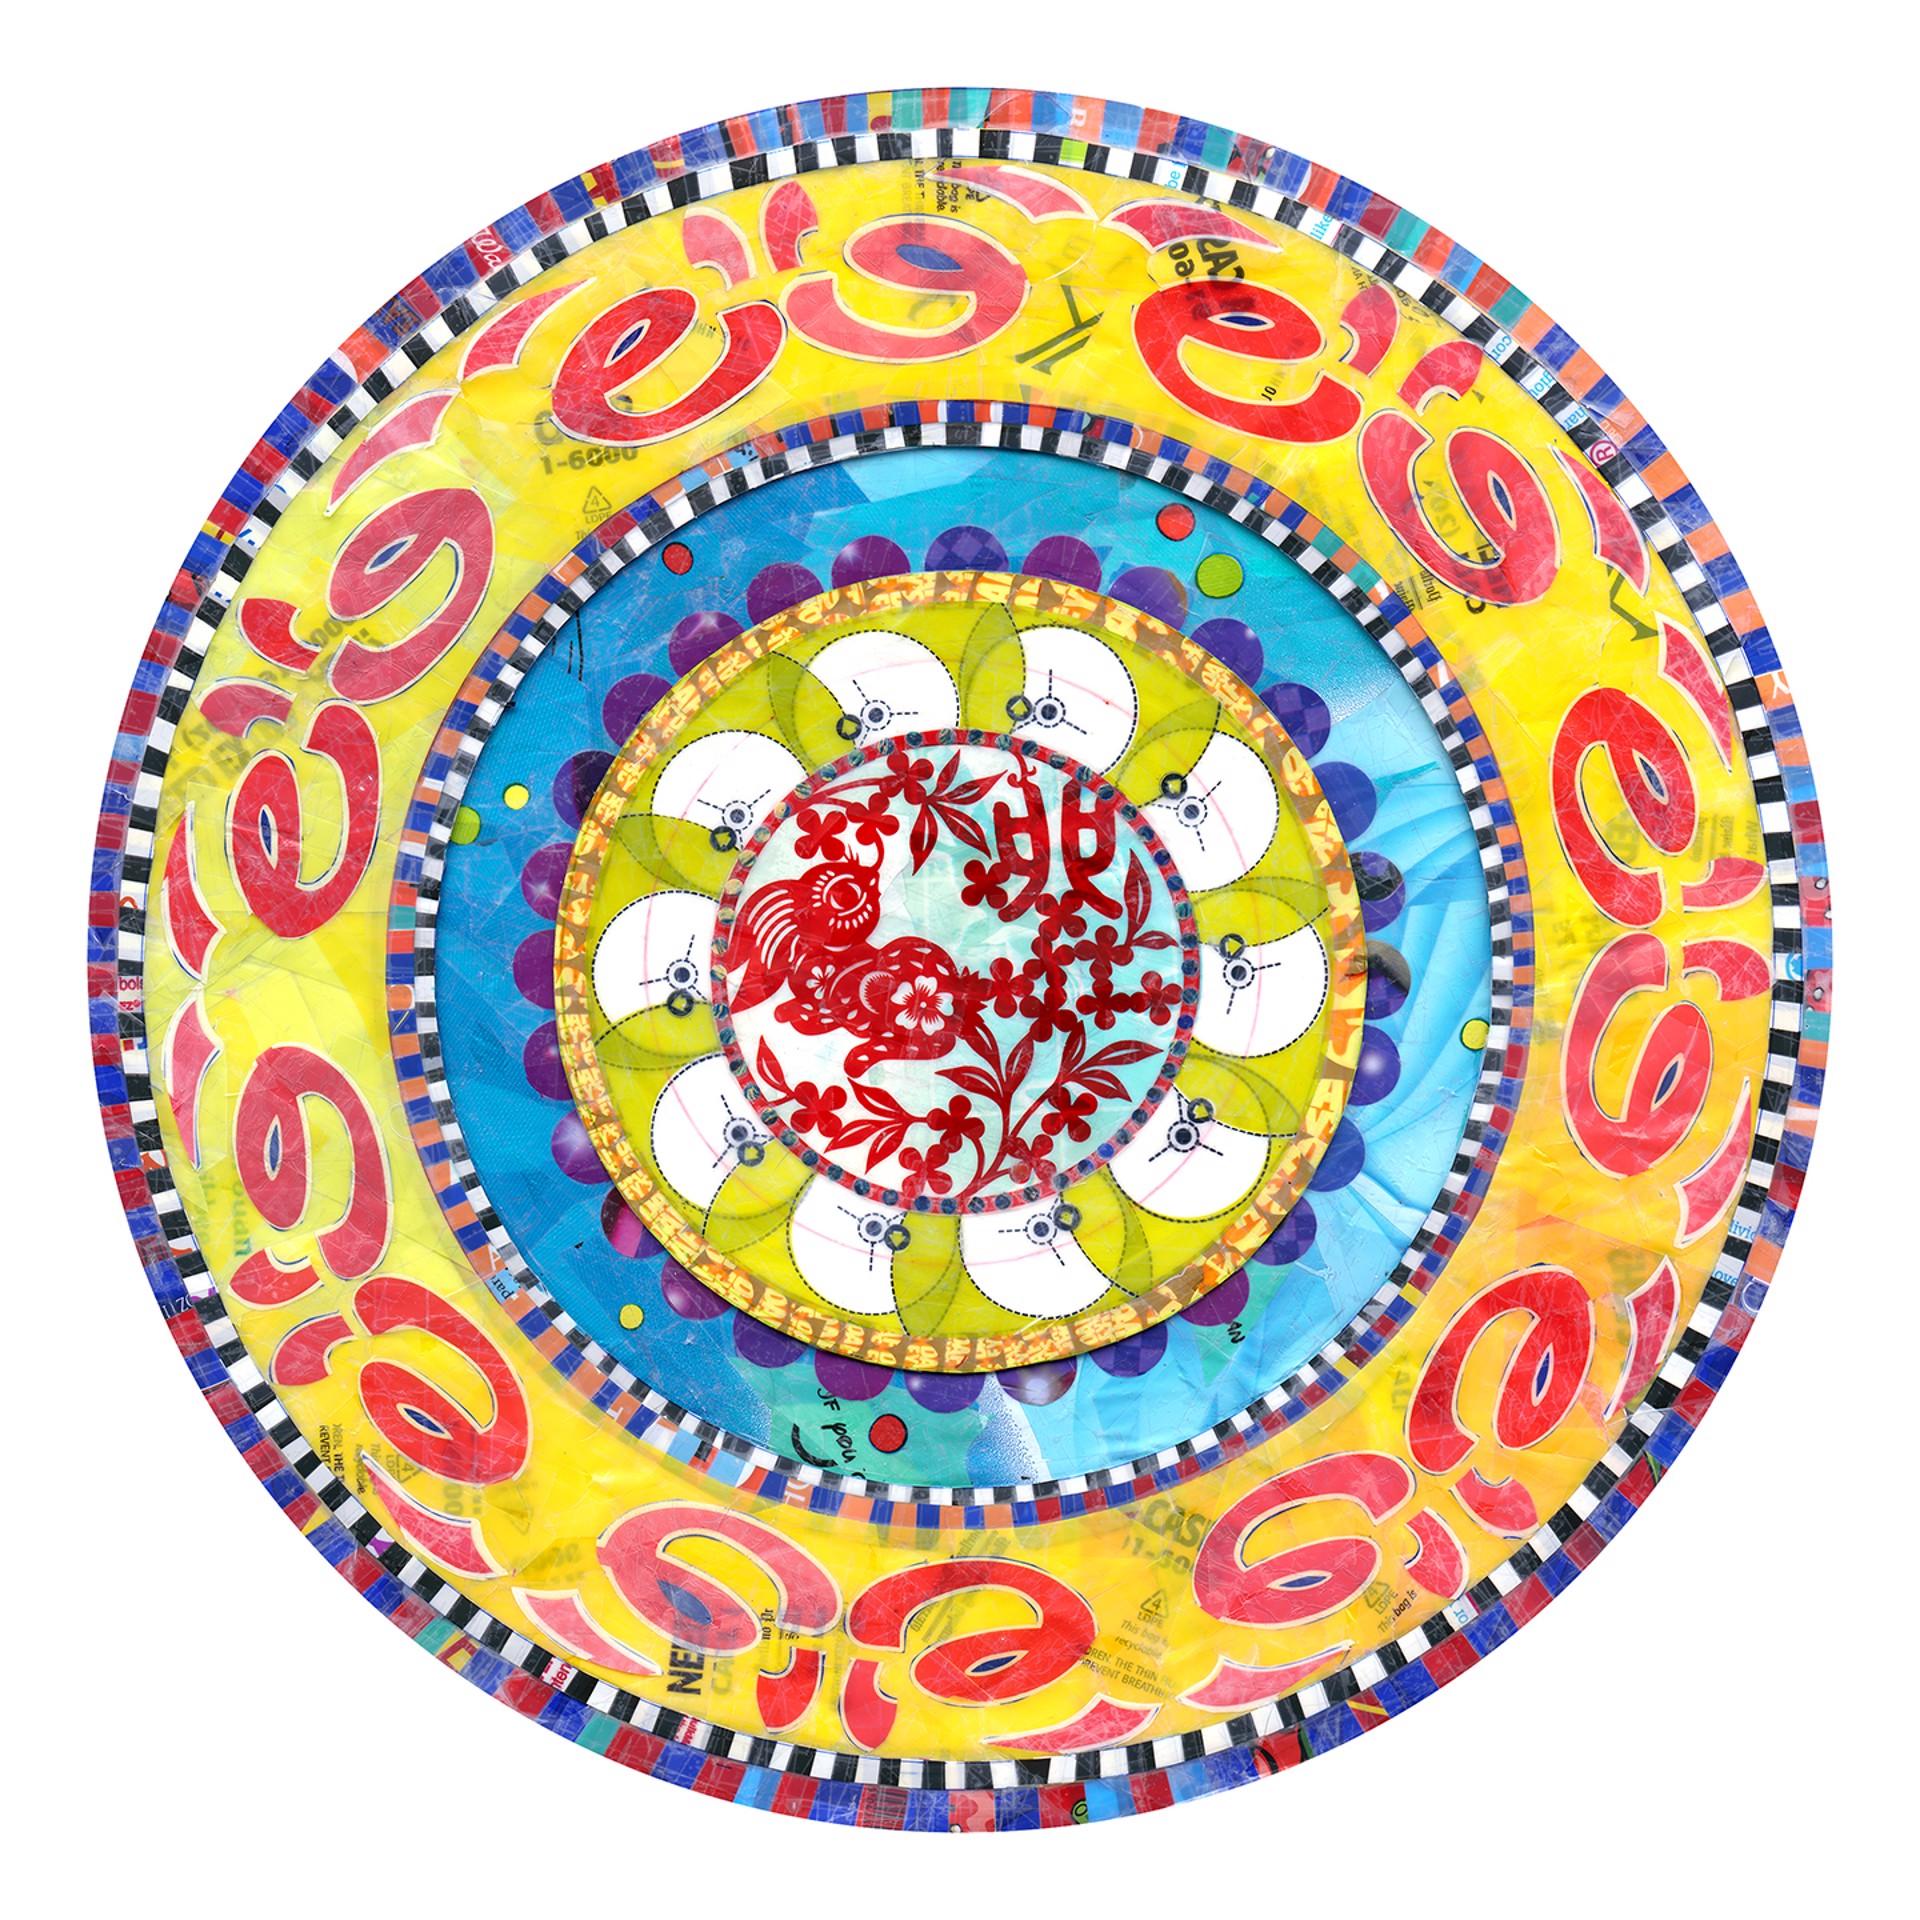 Power Flower Mandala by Virginia Fleck